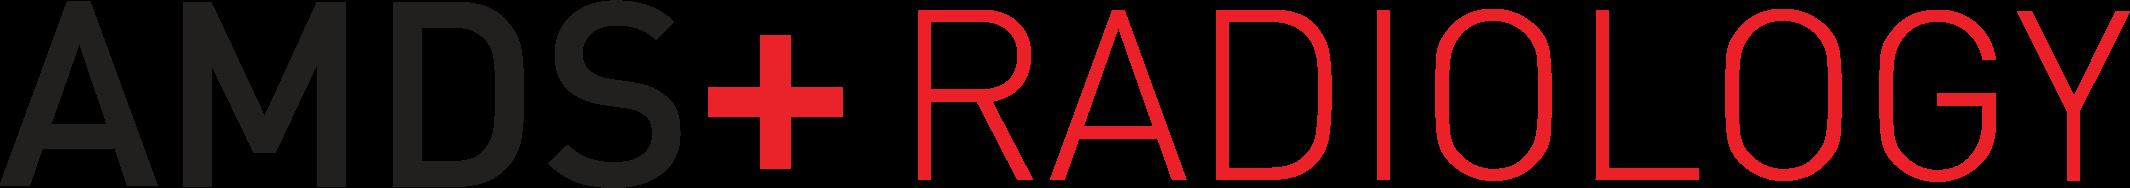 Xray clipart rad tech. Amds radiology logo